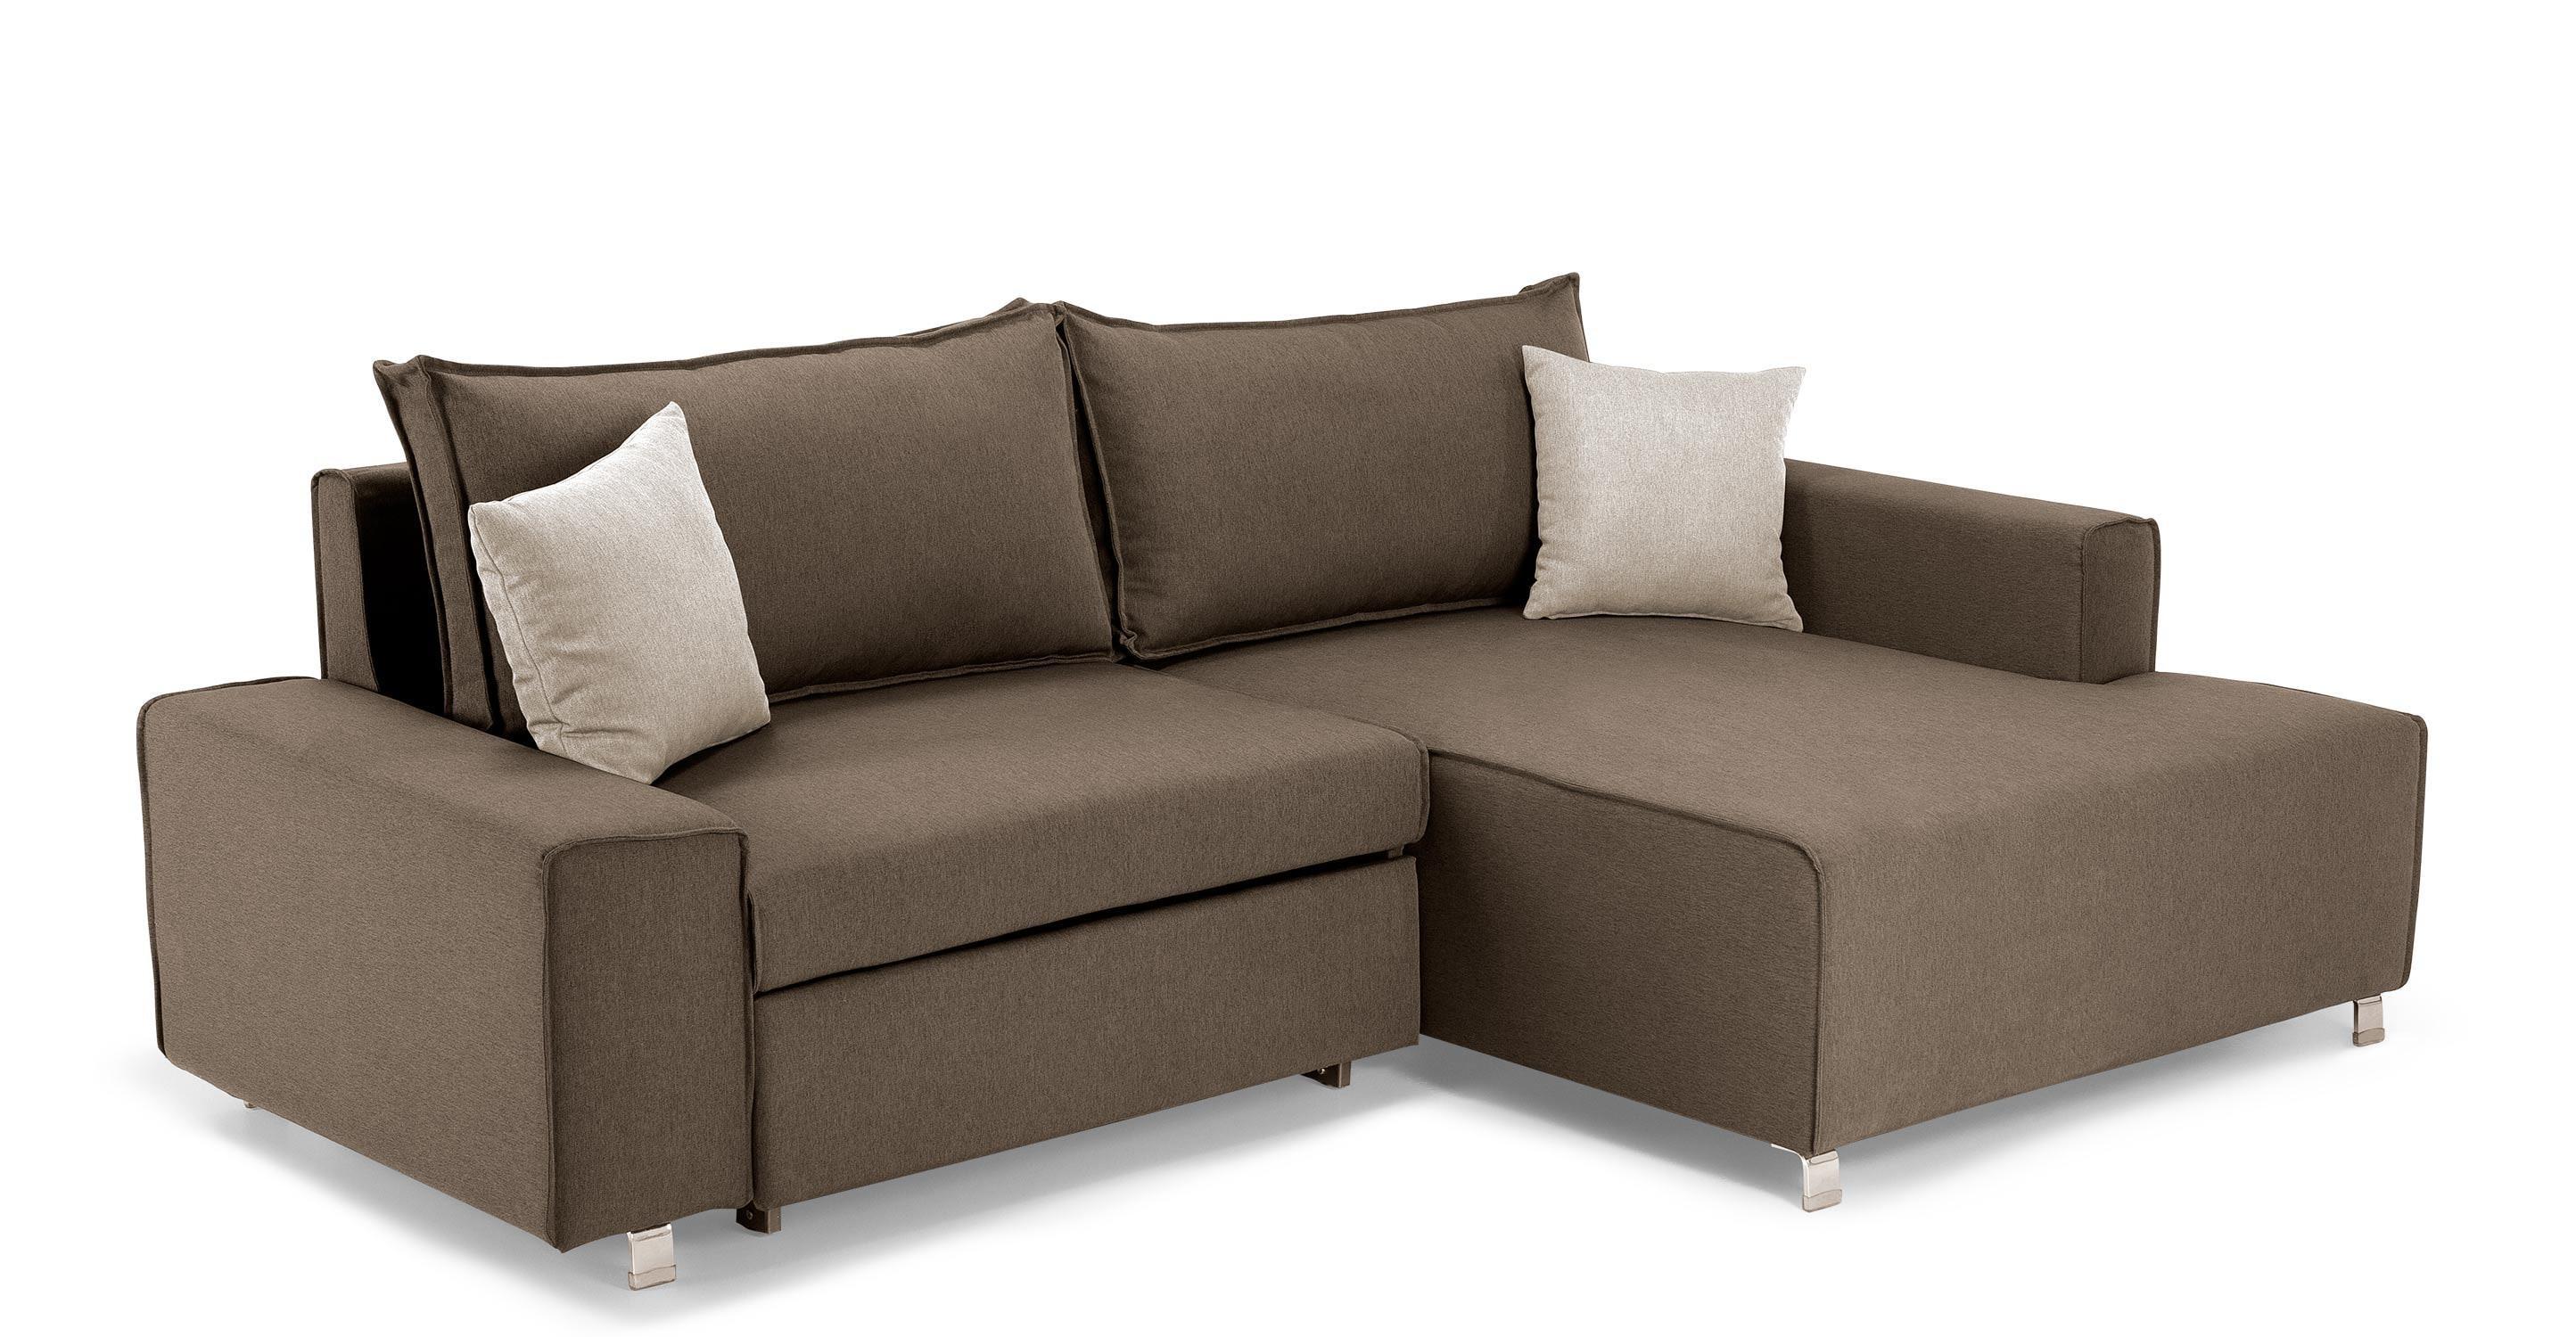 Sofas Center : Corner Sofa Beds Uk Cheap Birminghamcorner For With Regard To Cheap Corner Sofa Beds (View 7 of 20)